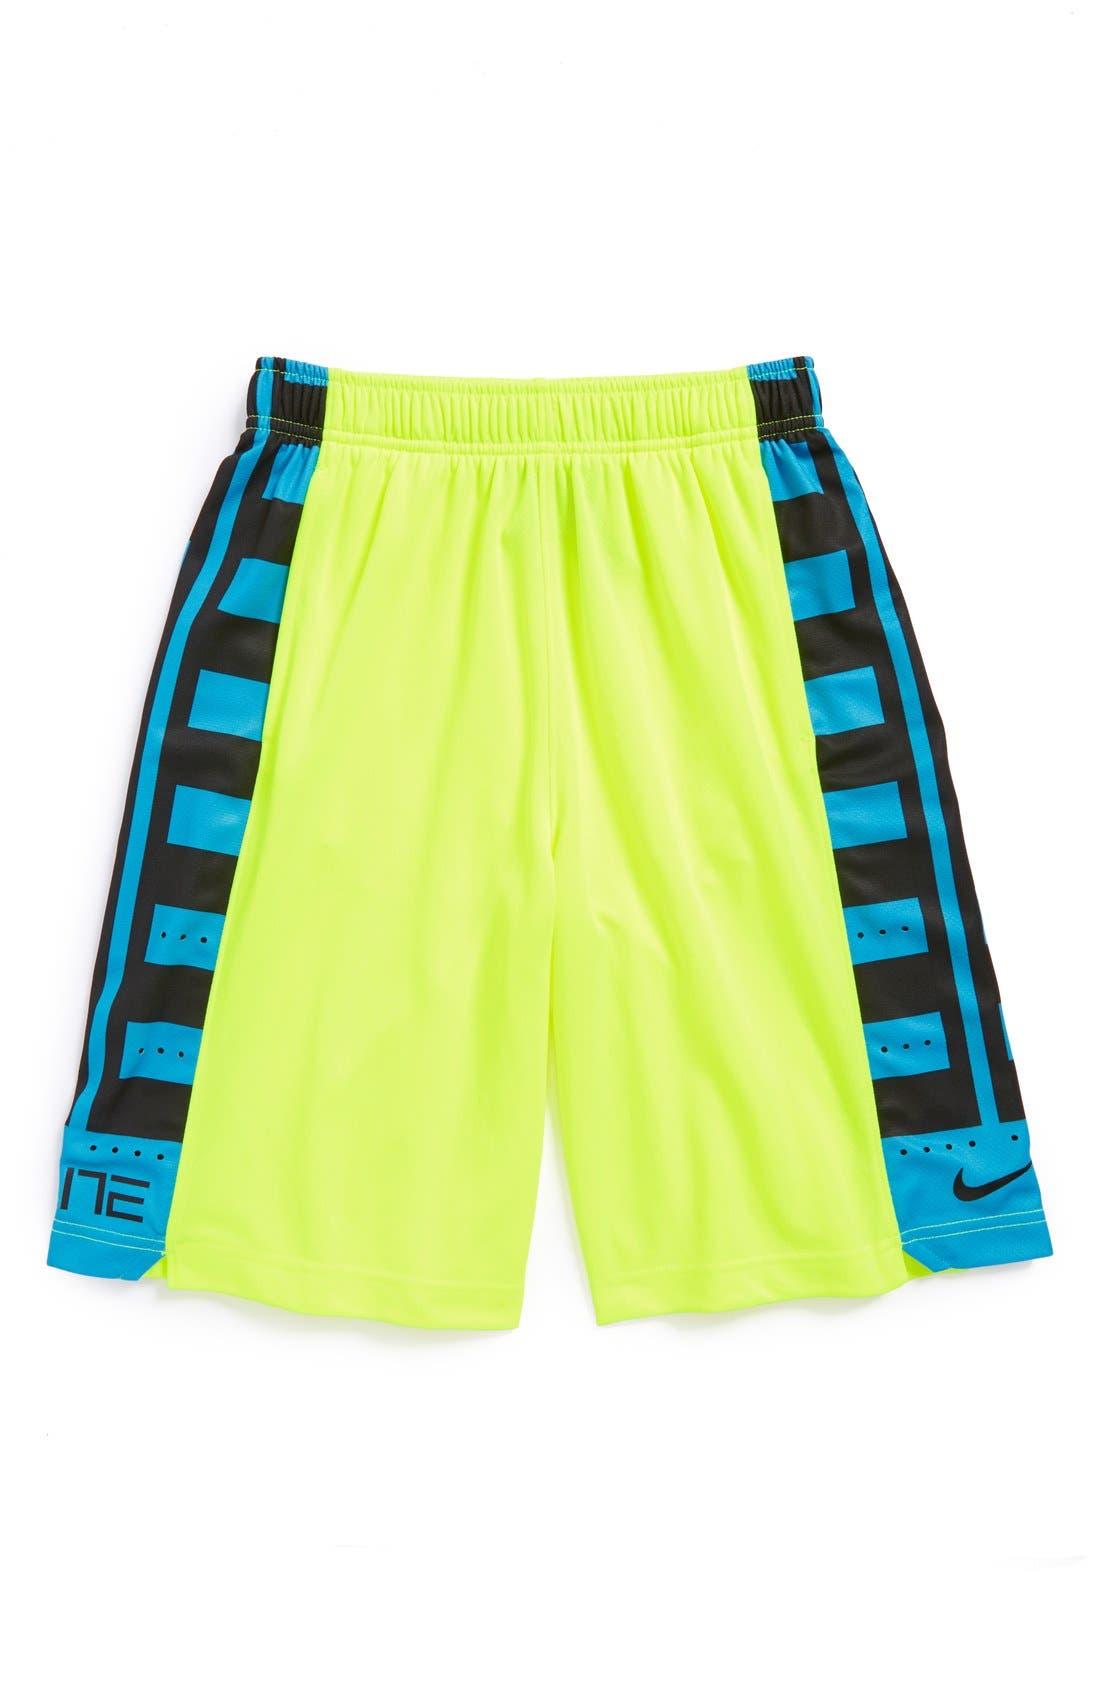 Main Image - Nike 'Fanatical' Dri-FIT Mesh Shorts (Big Boys)